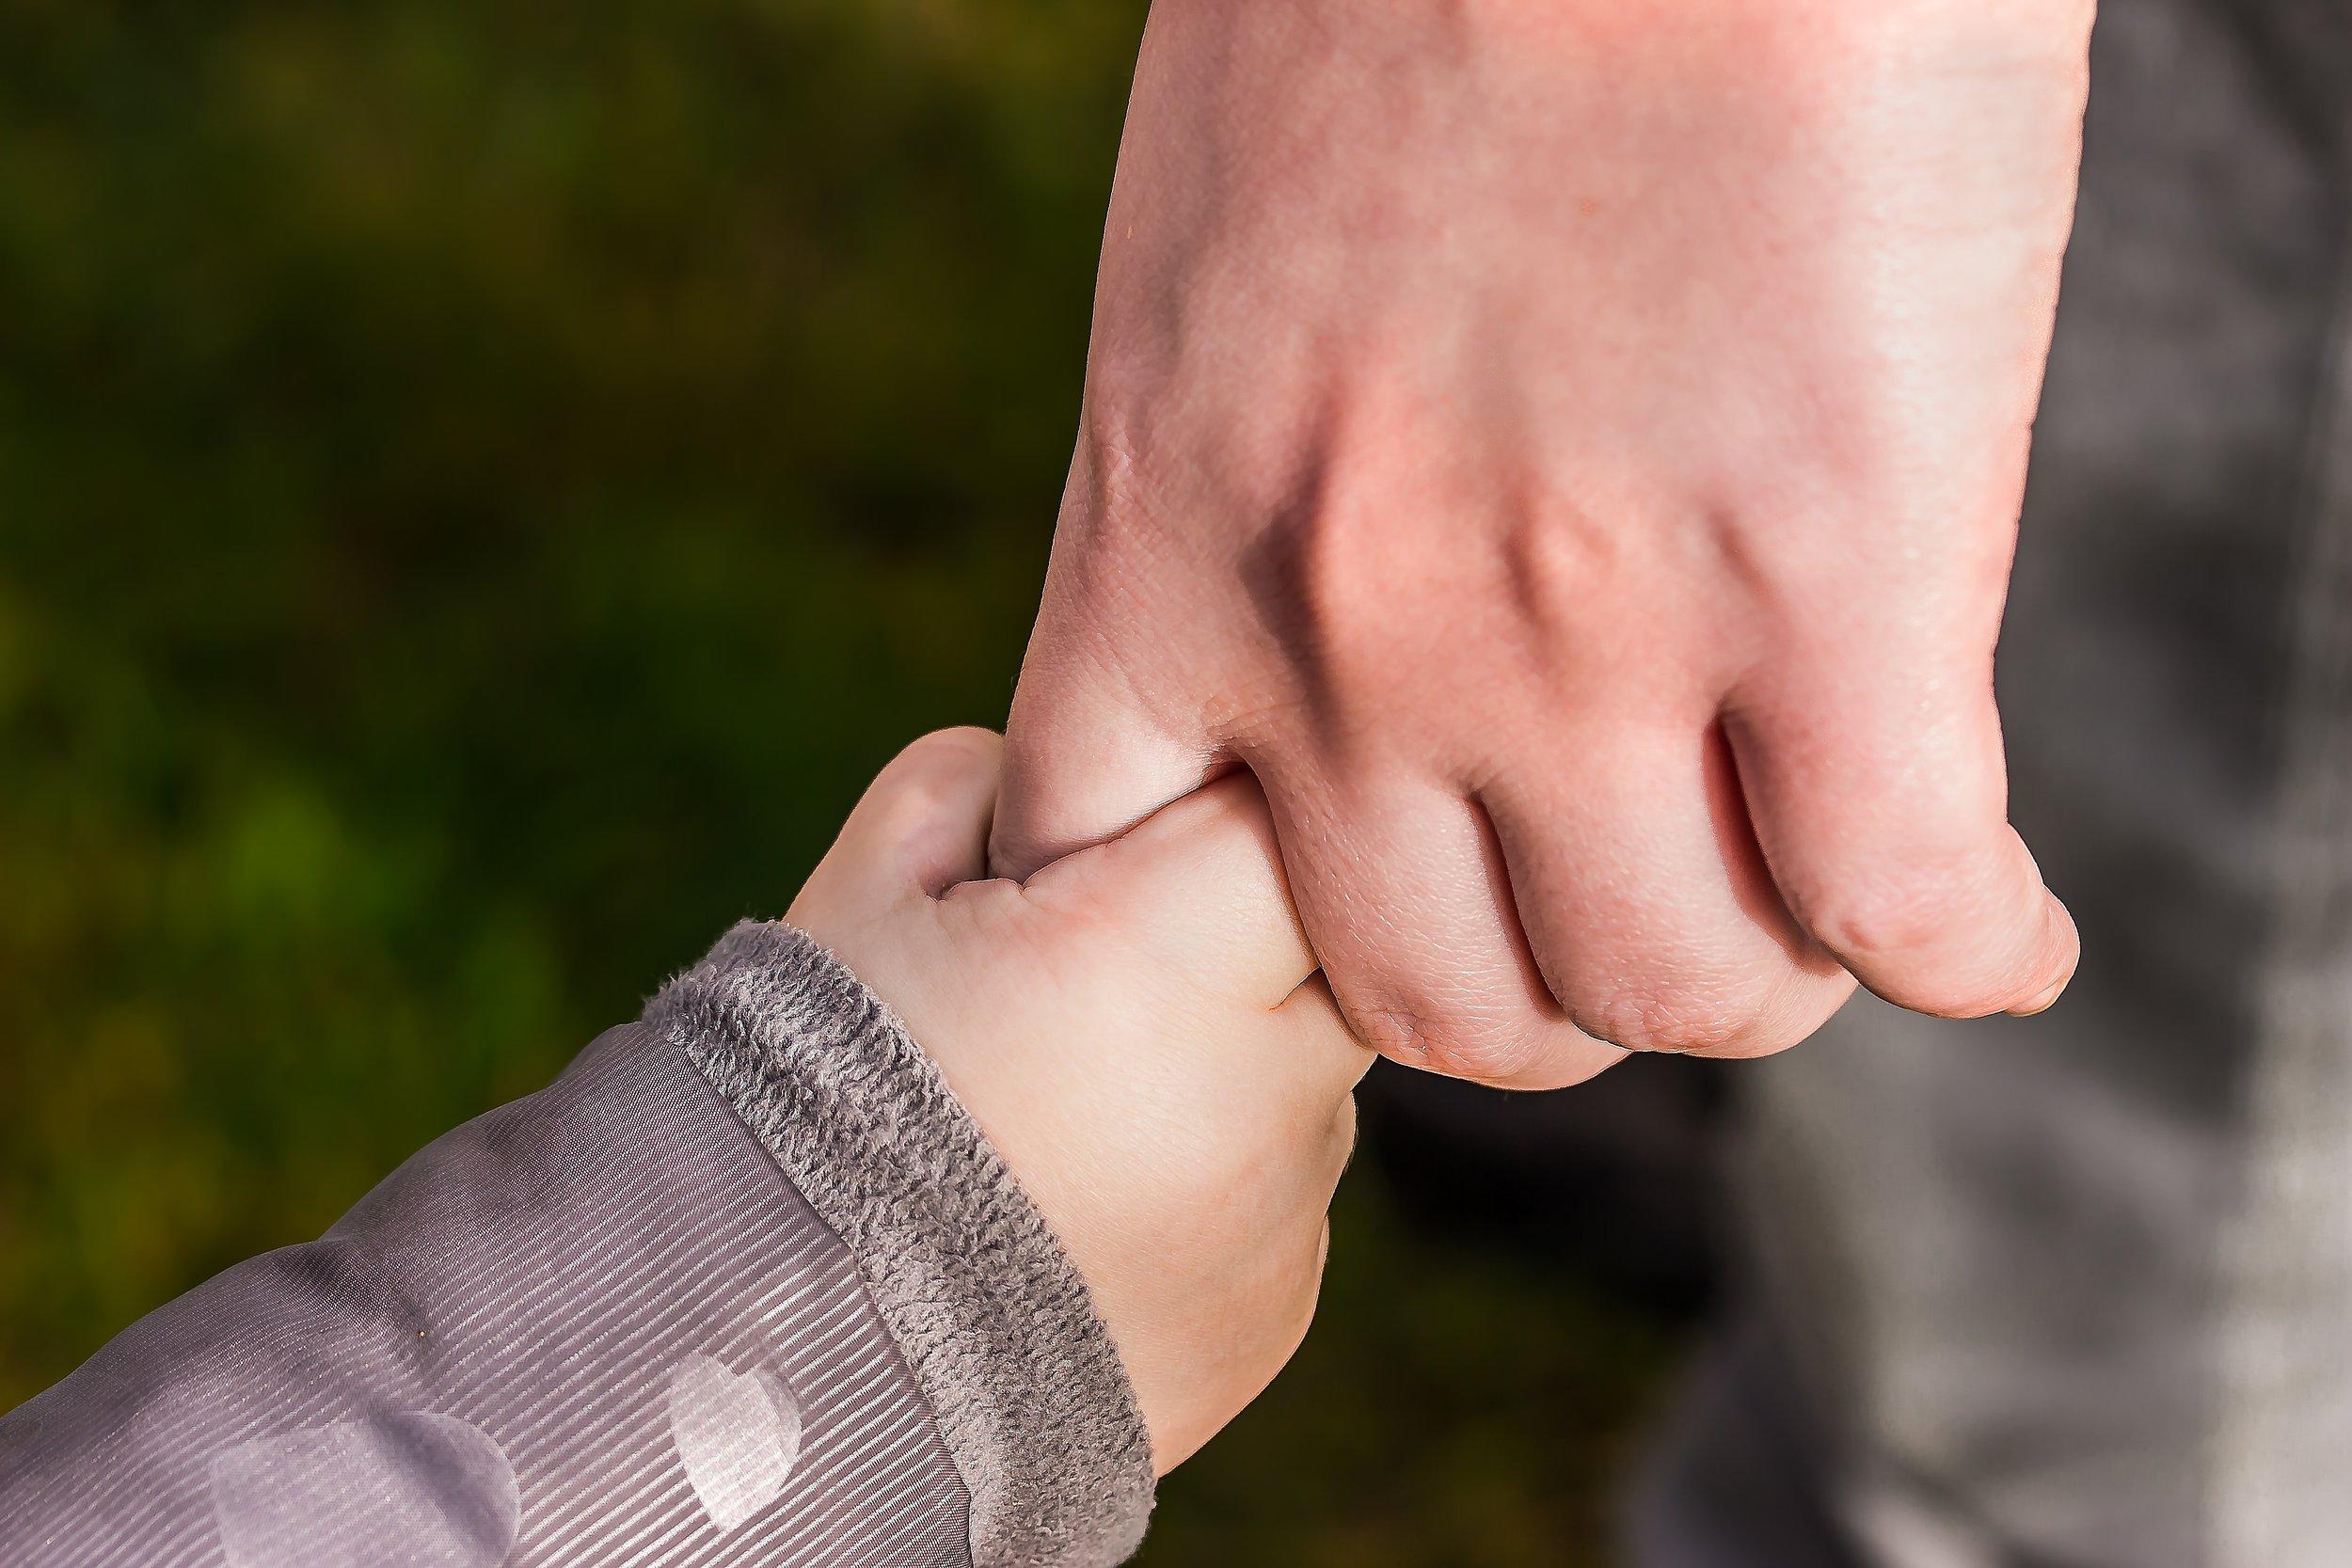 parent-baby-legal-legislation